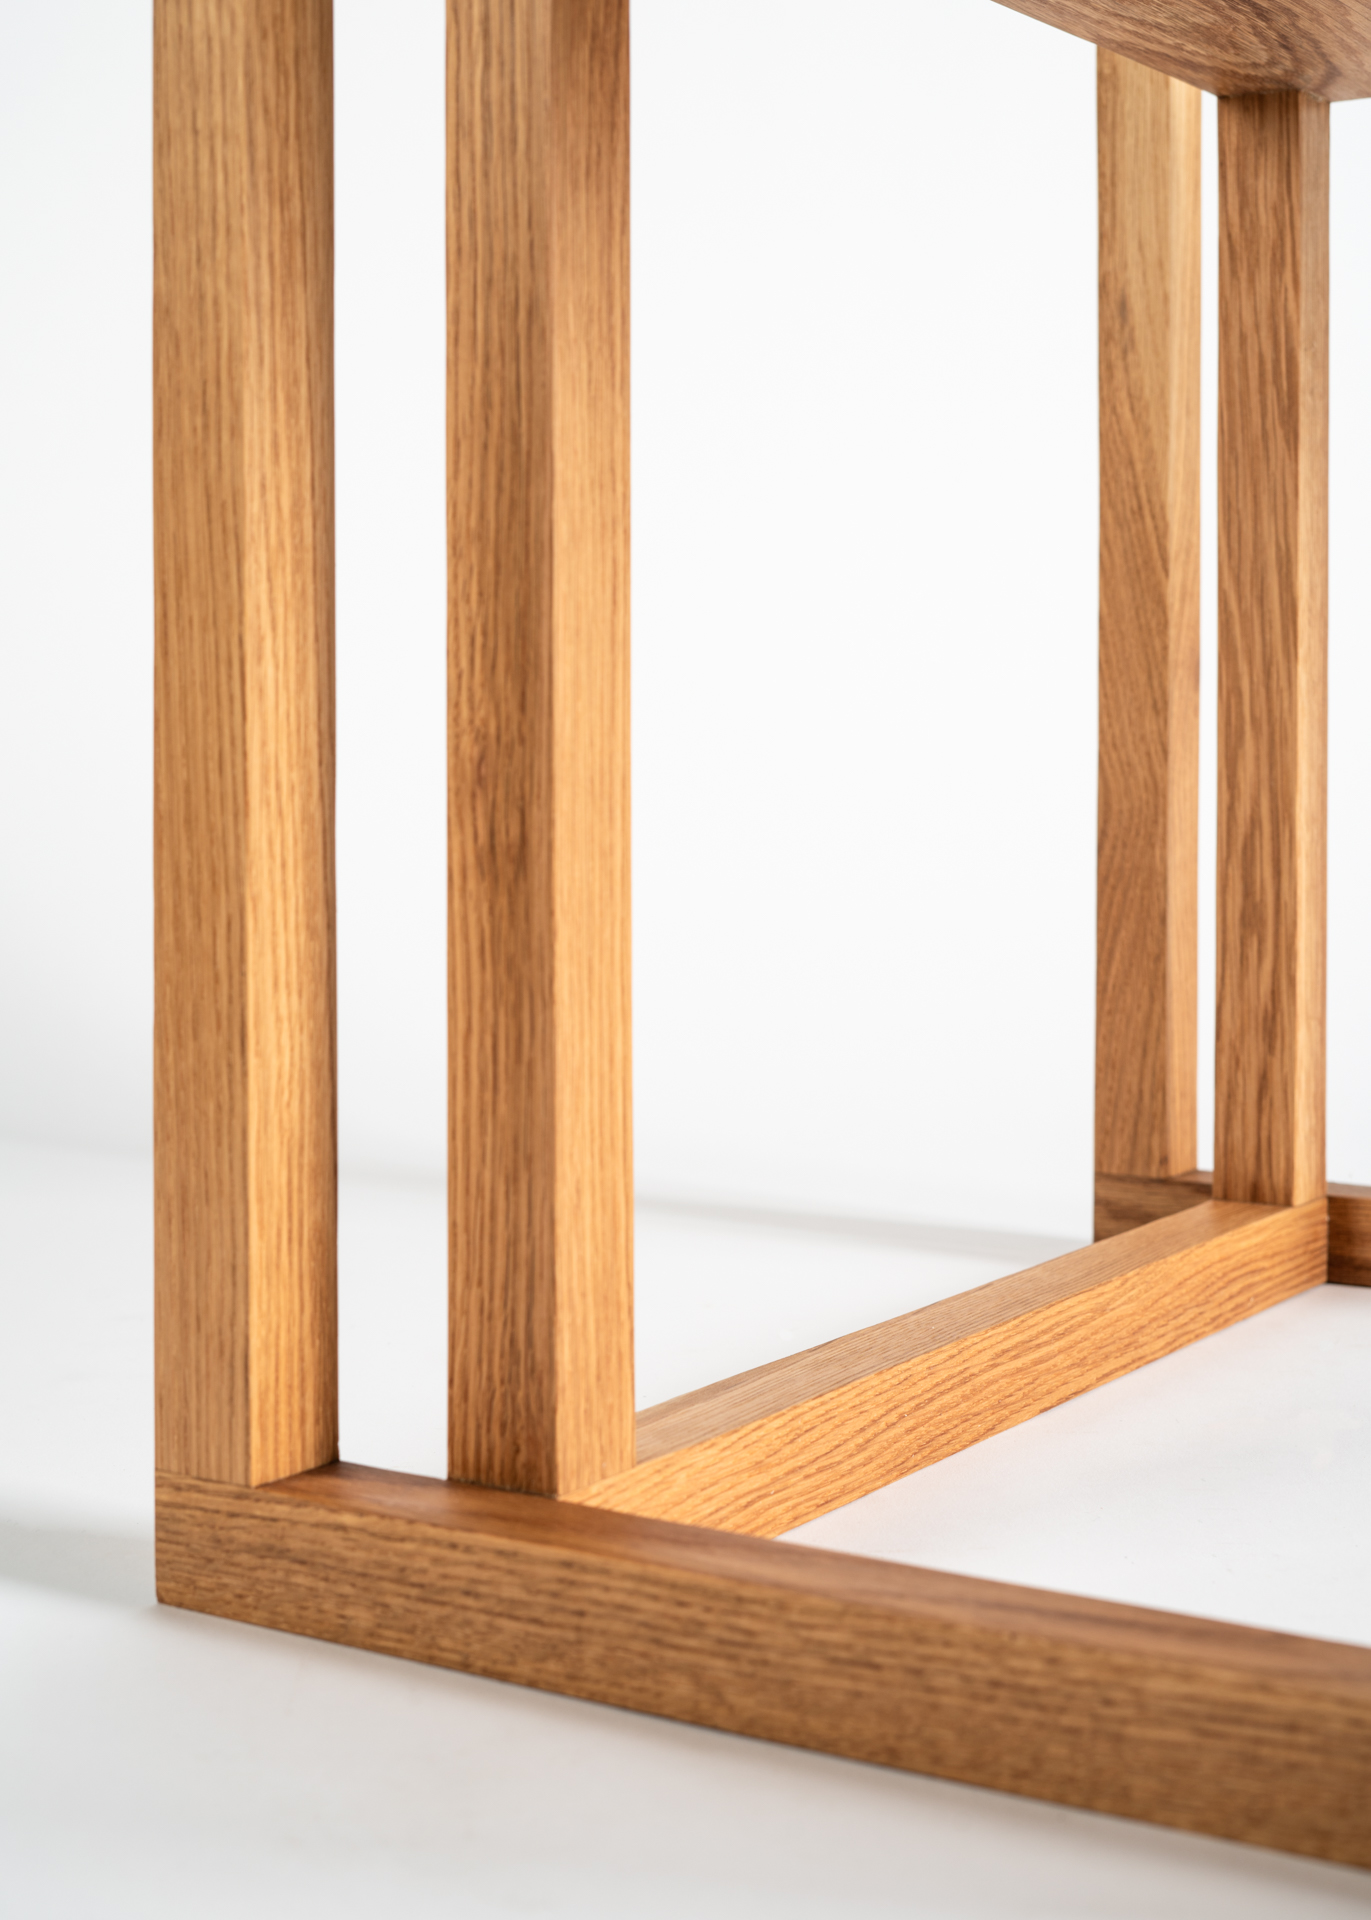 Furniture-web-43.jpg